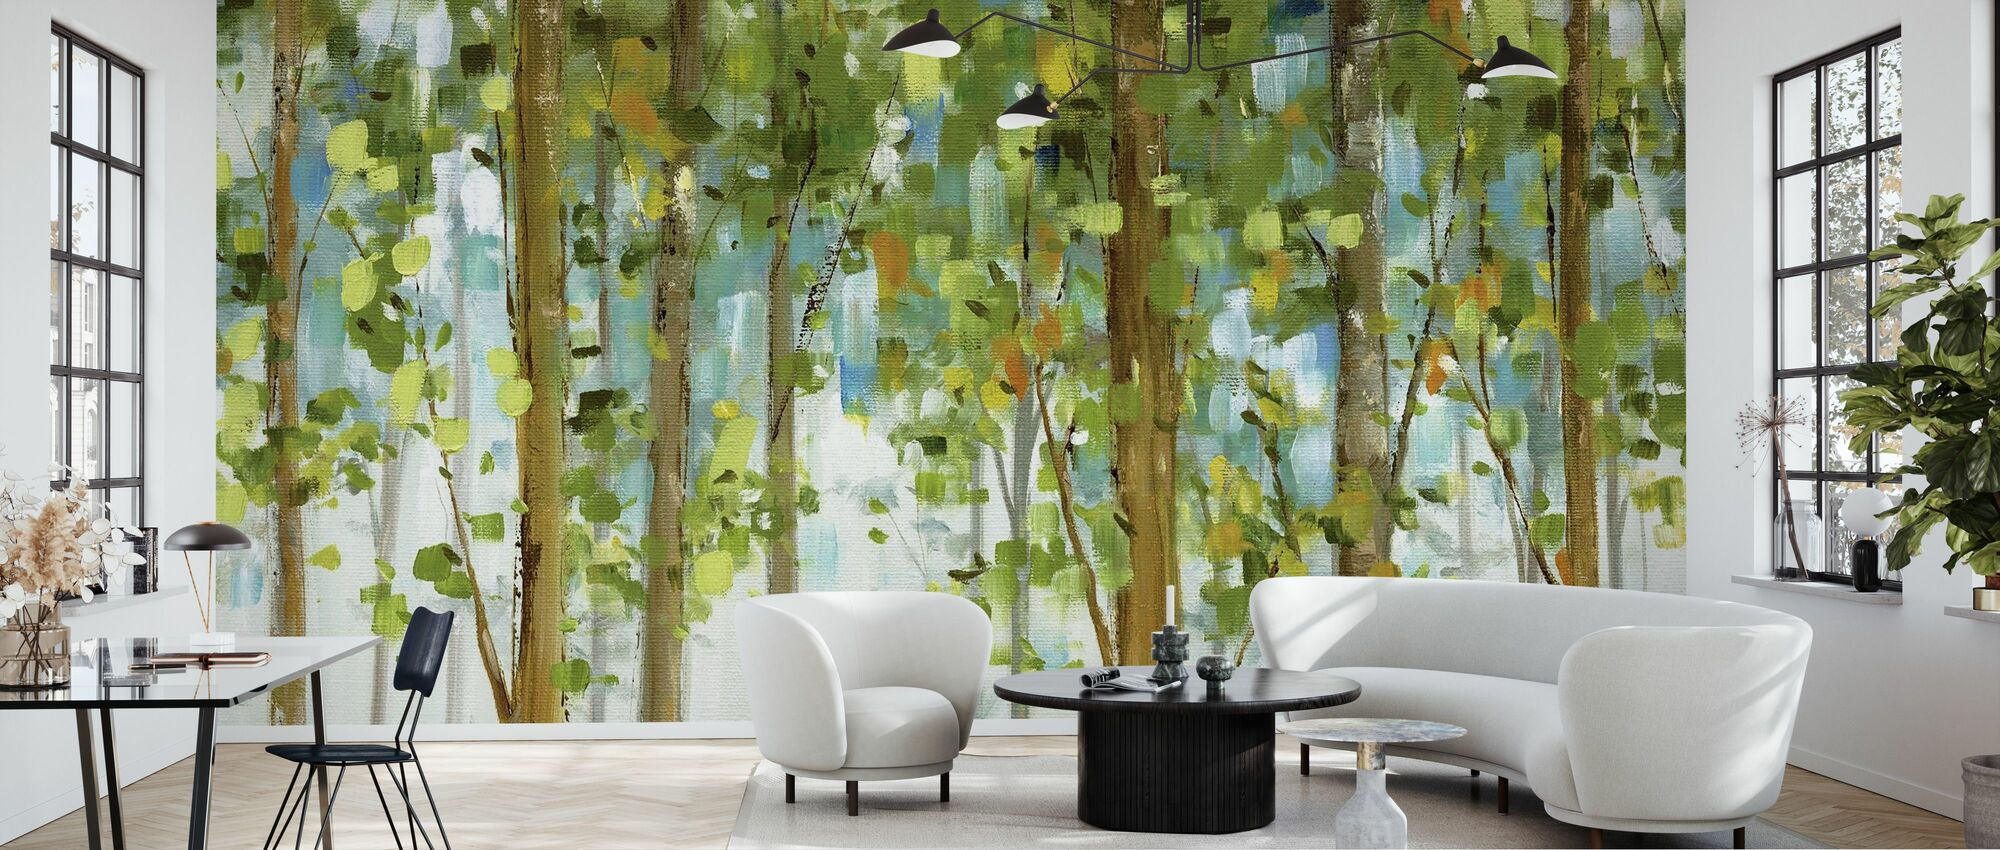 Forest Study - Wallpaper - Living Room